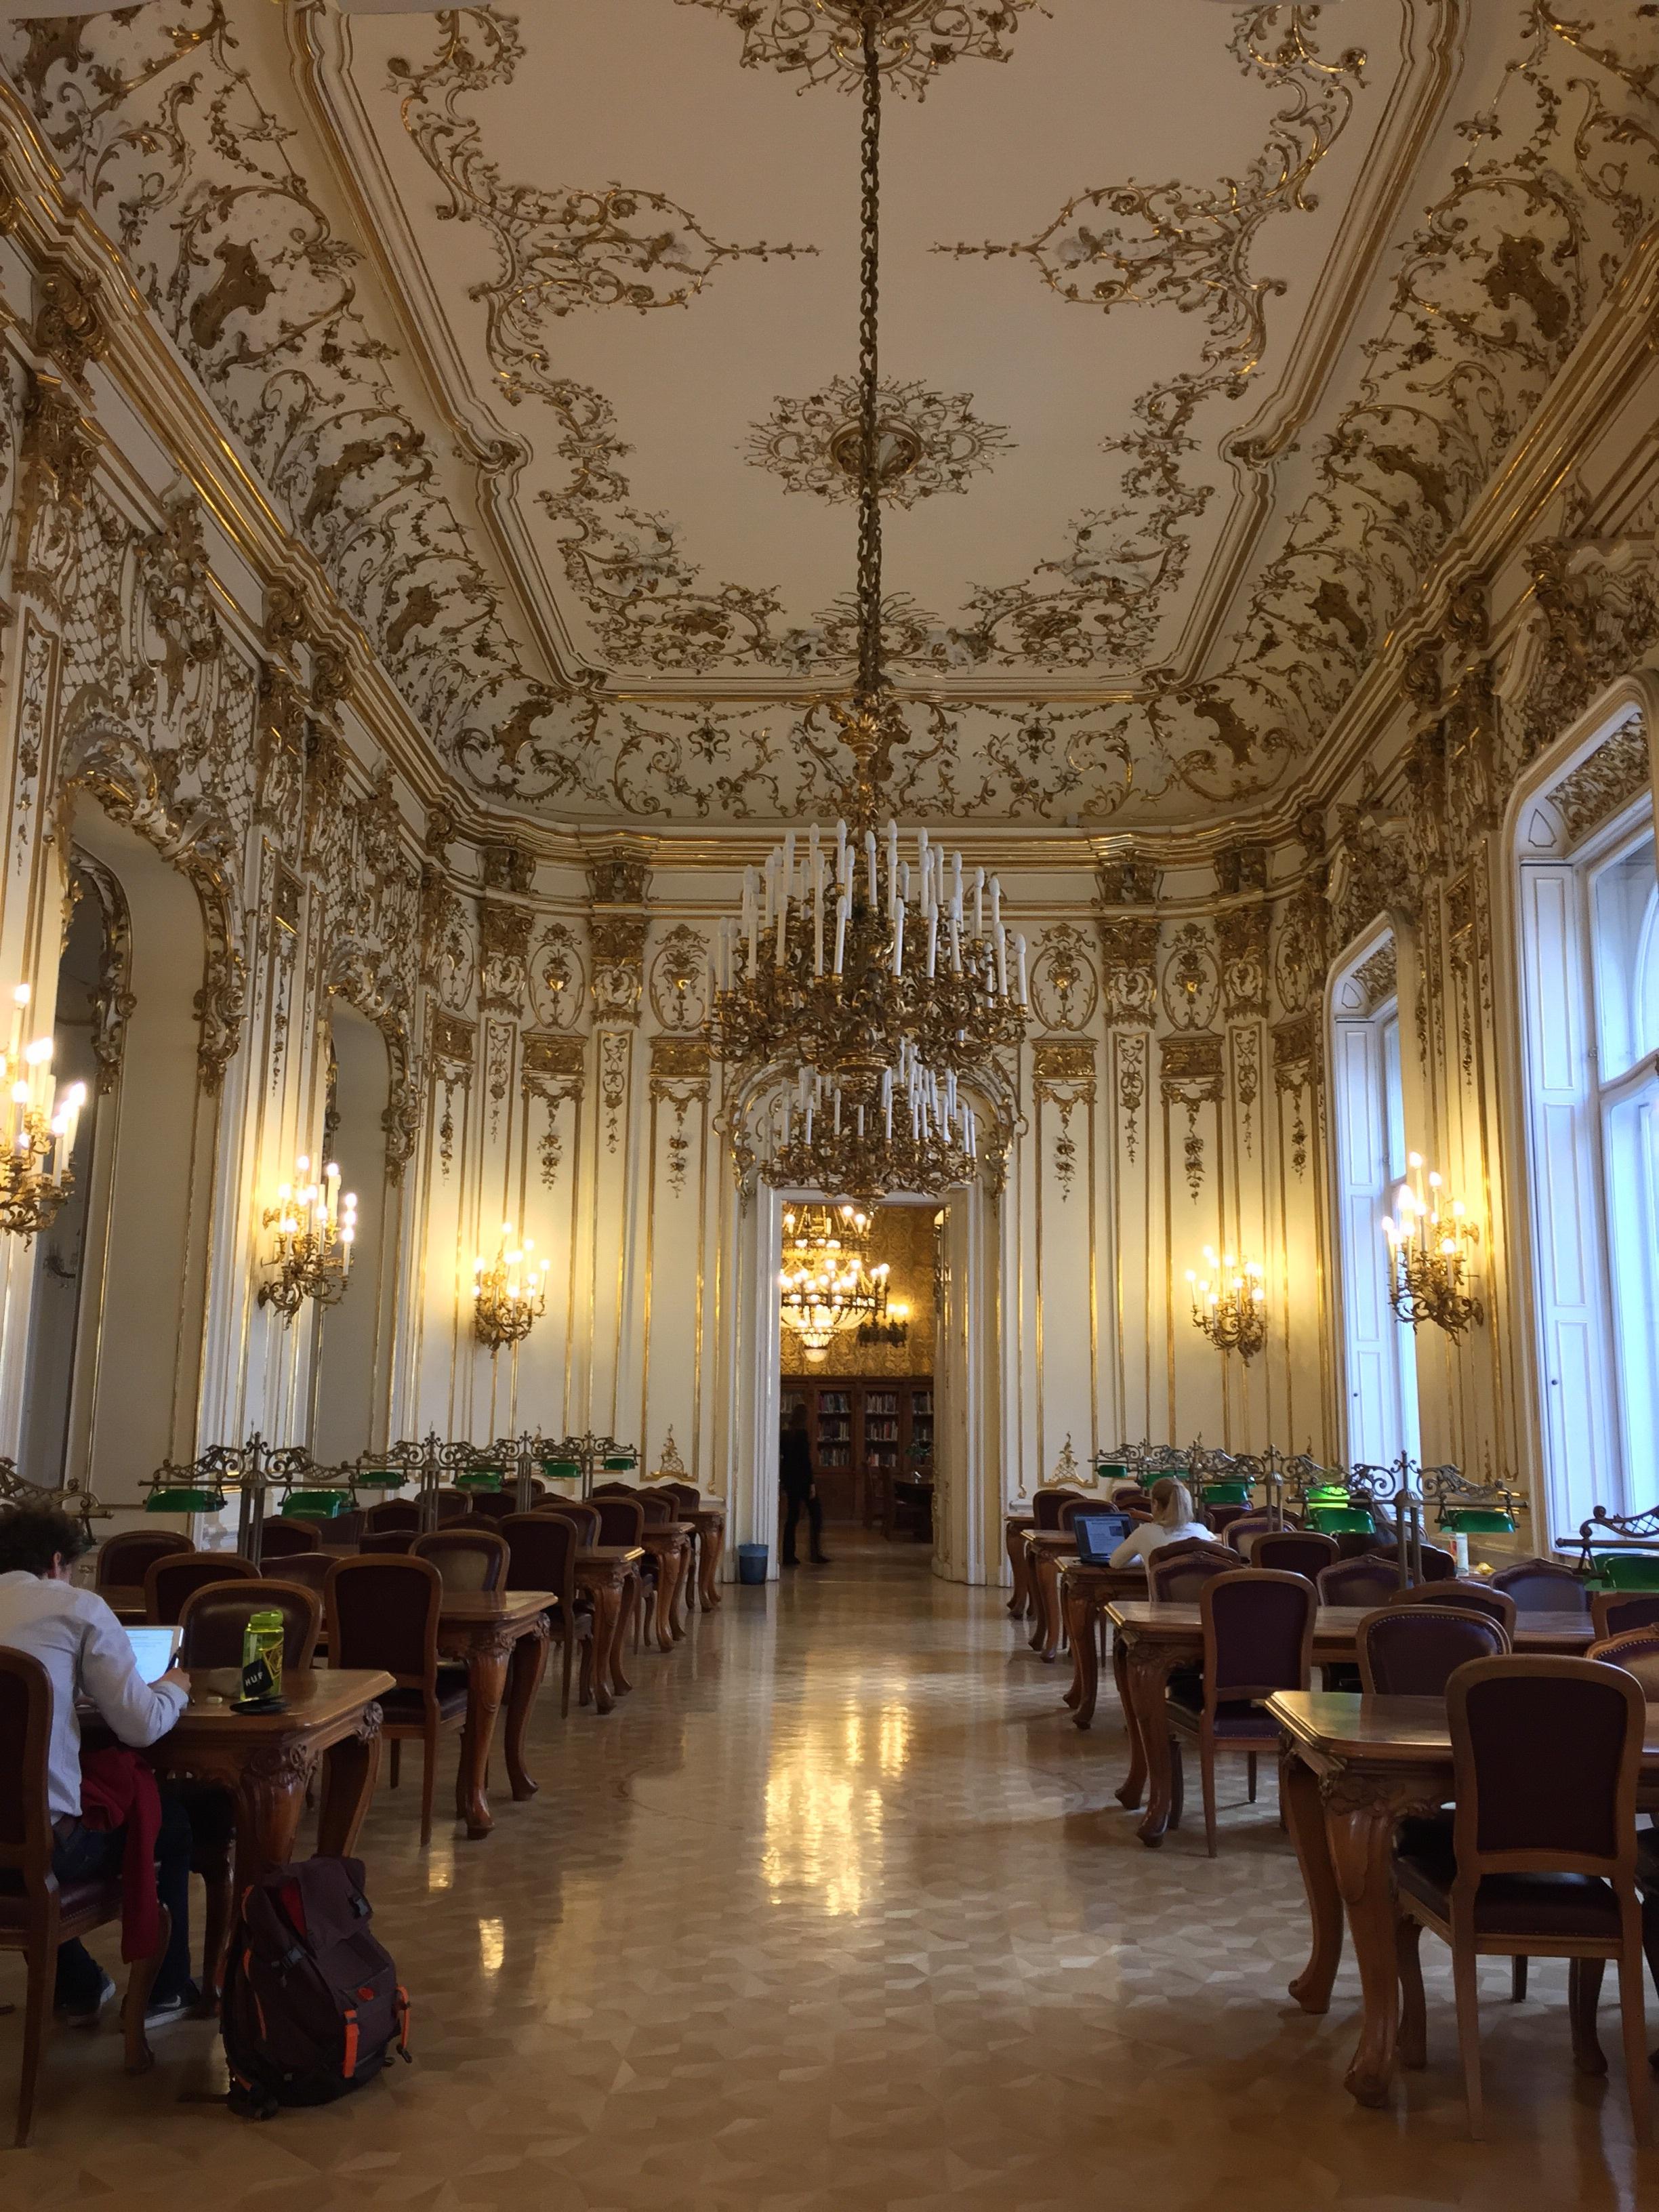 A study hall inside the Metropolitan Library